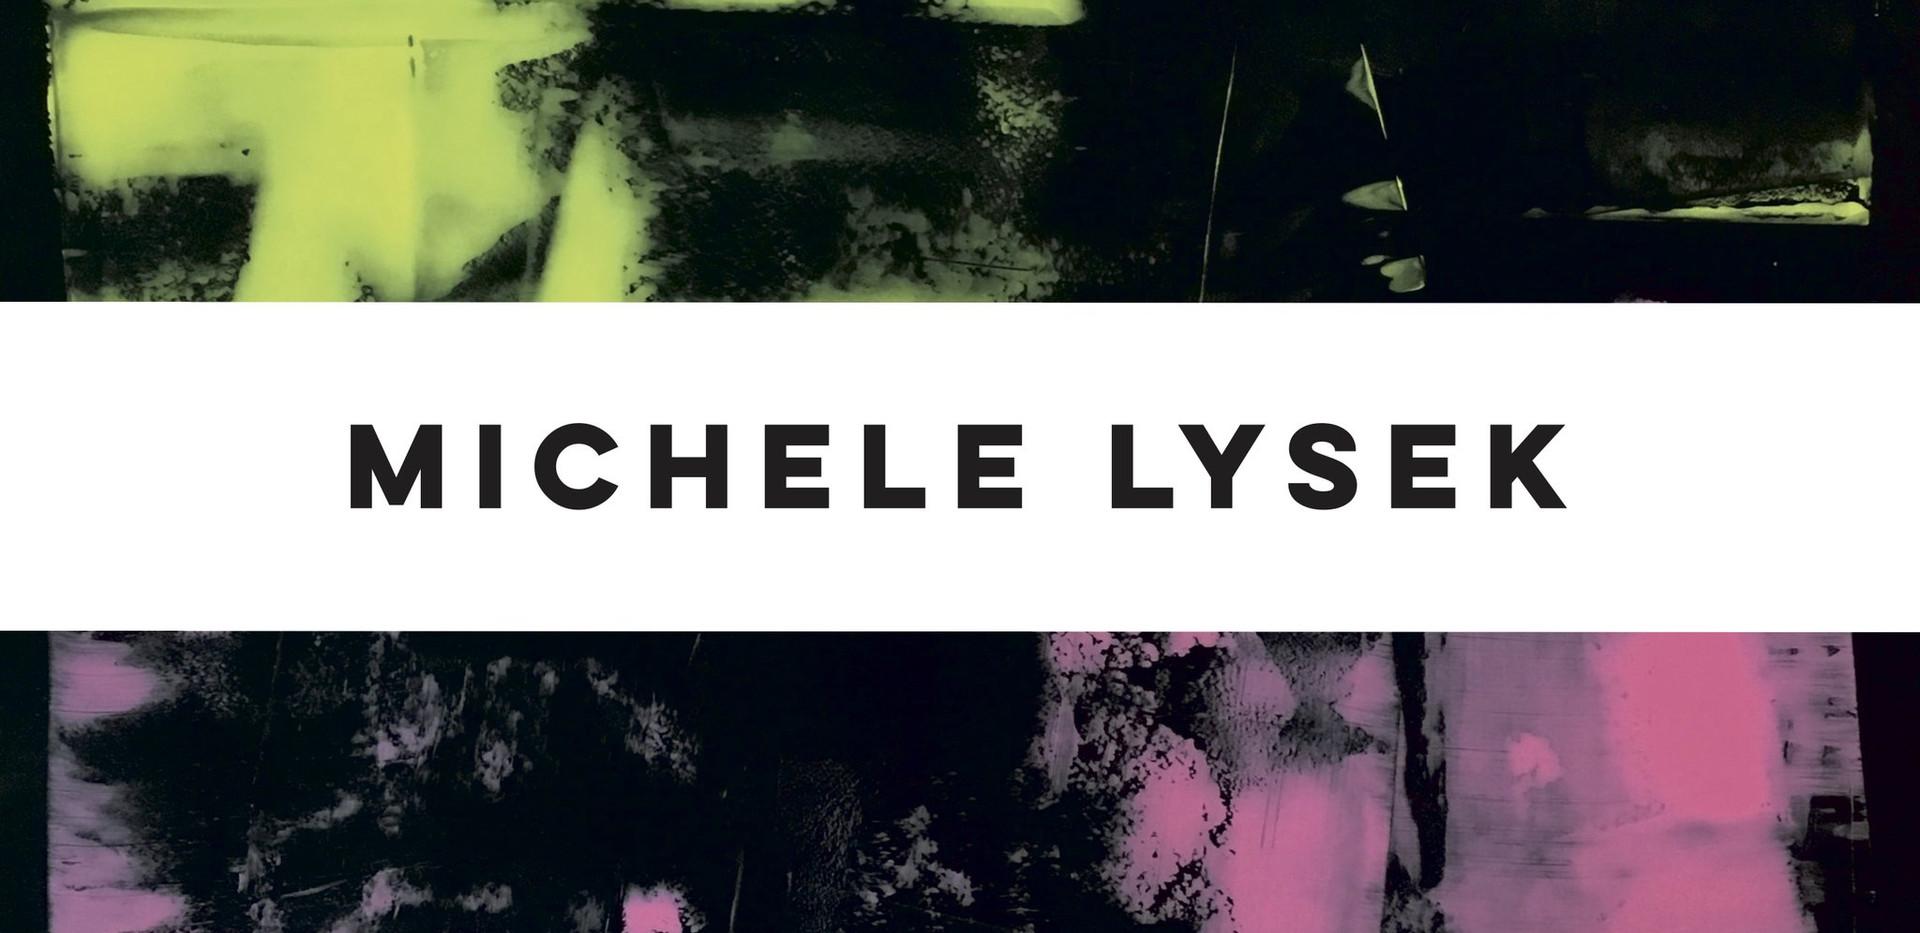 MICHELE LYSEK catalog 2019 cover